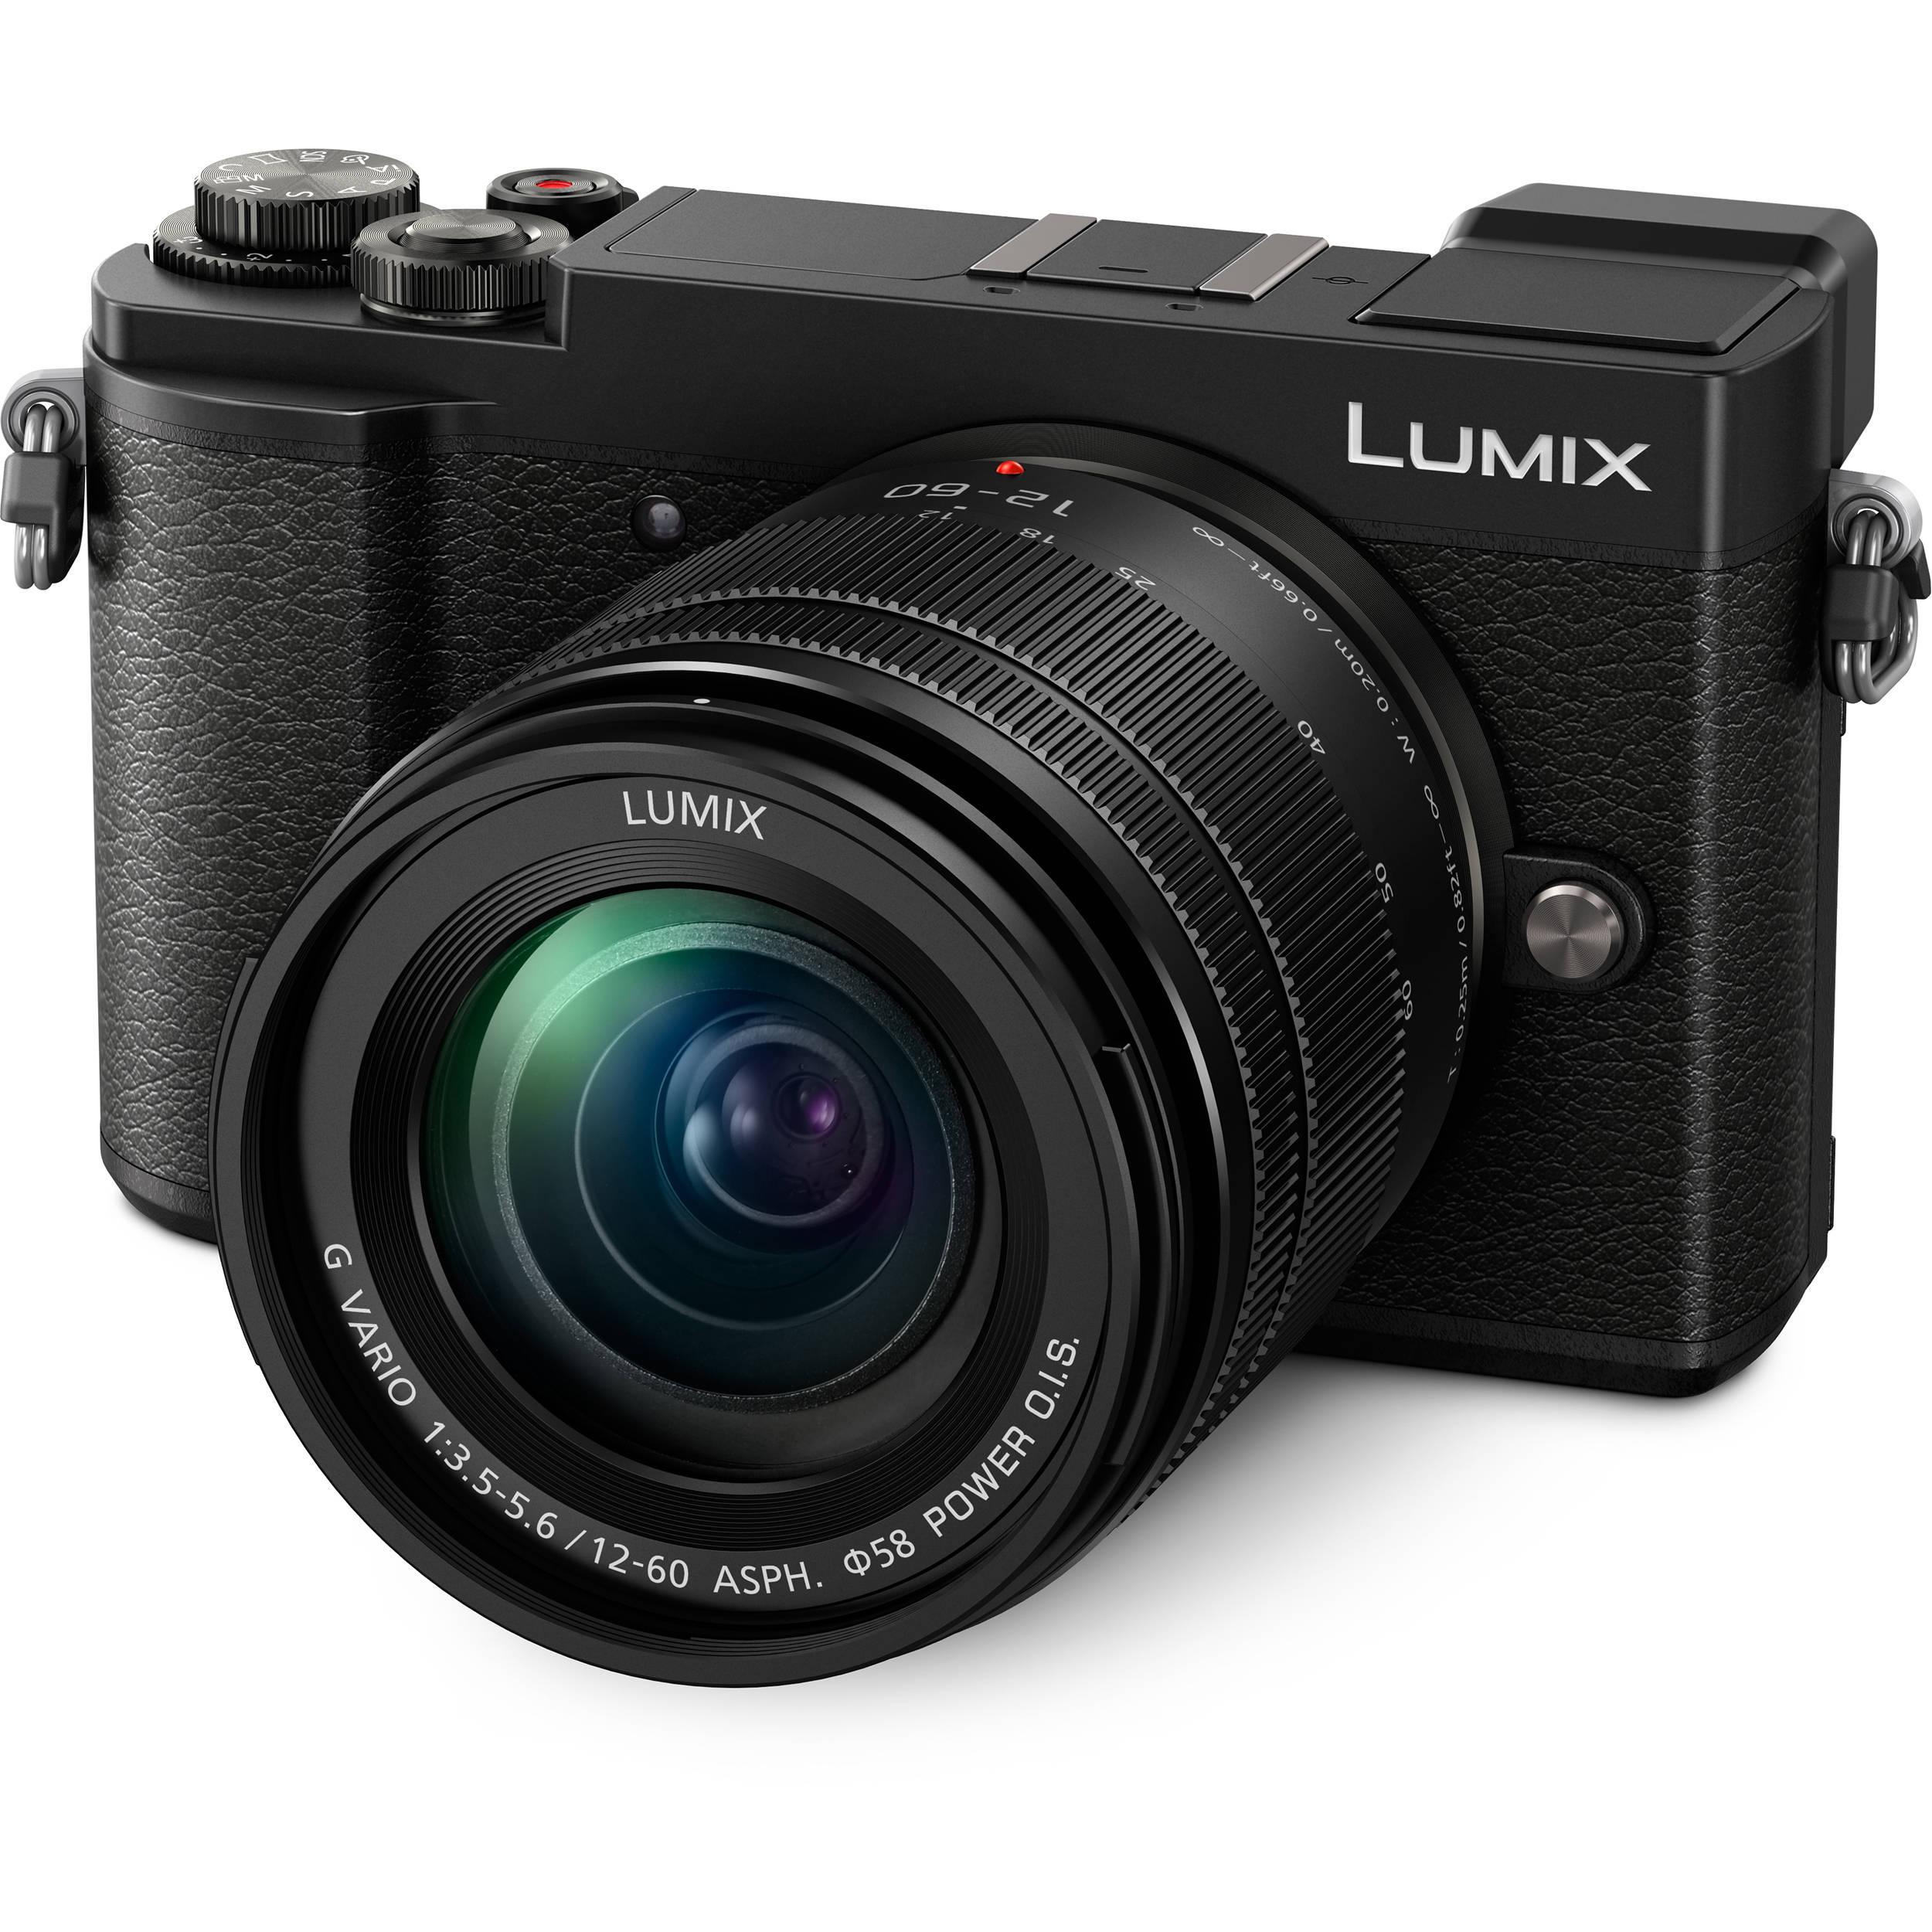 Image result for Panasonic Lumix GX9